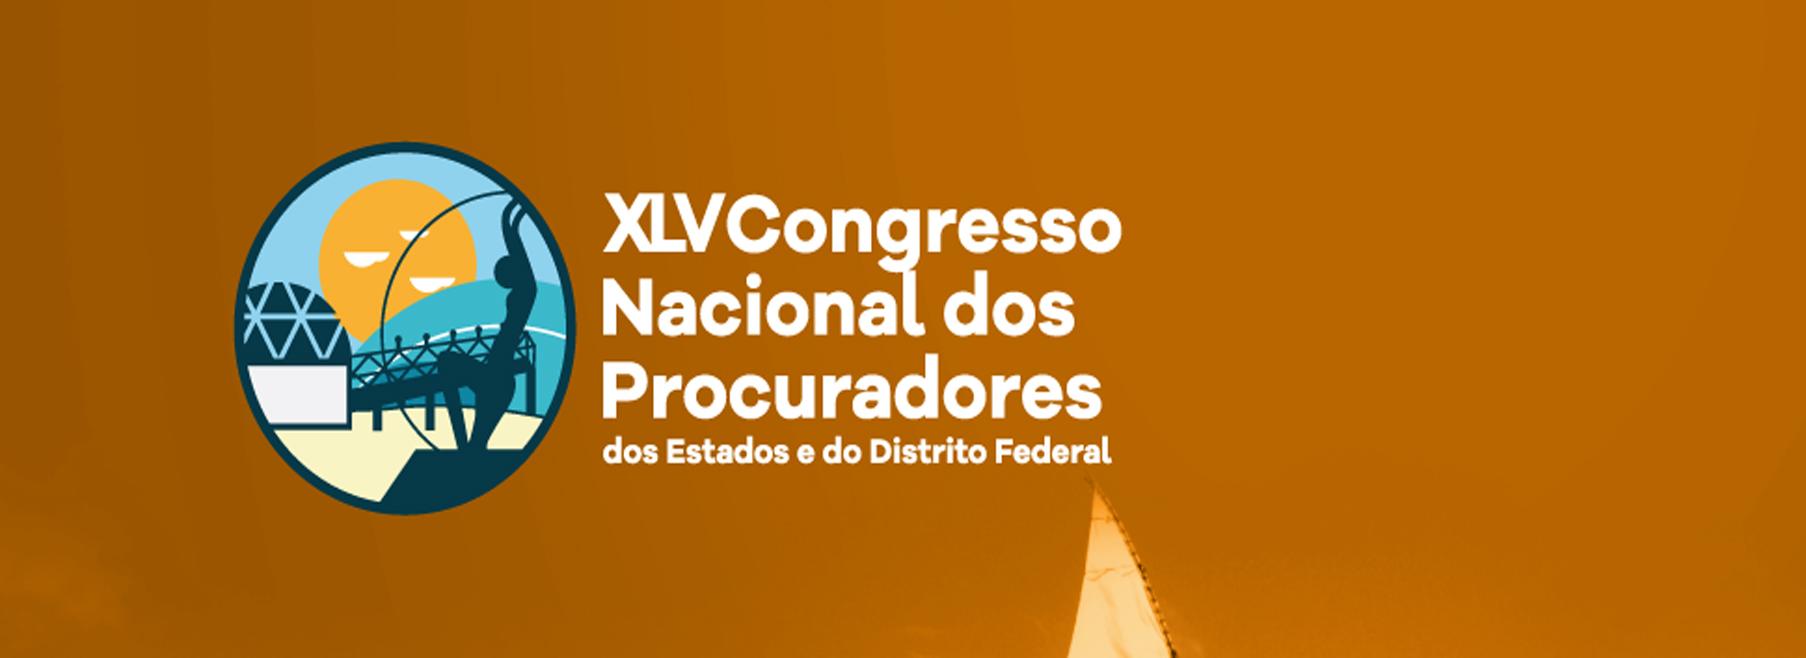 Falta pouco para o Congresso Nacional  dos Procuradores dos Estados